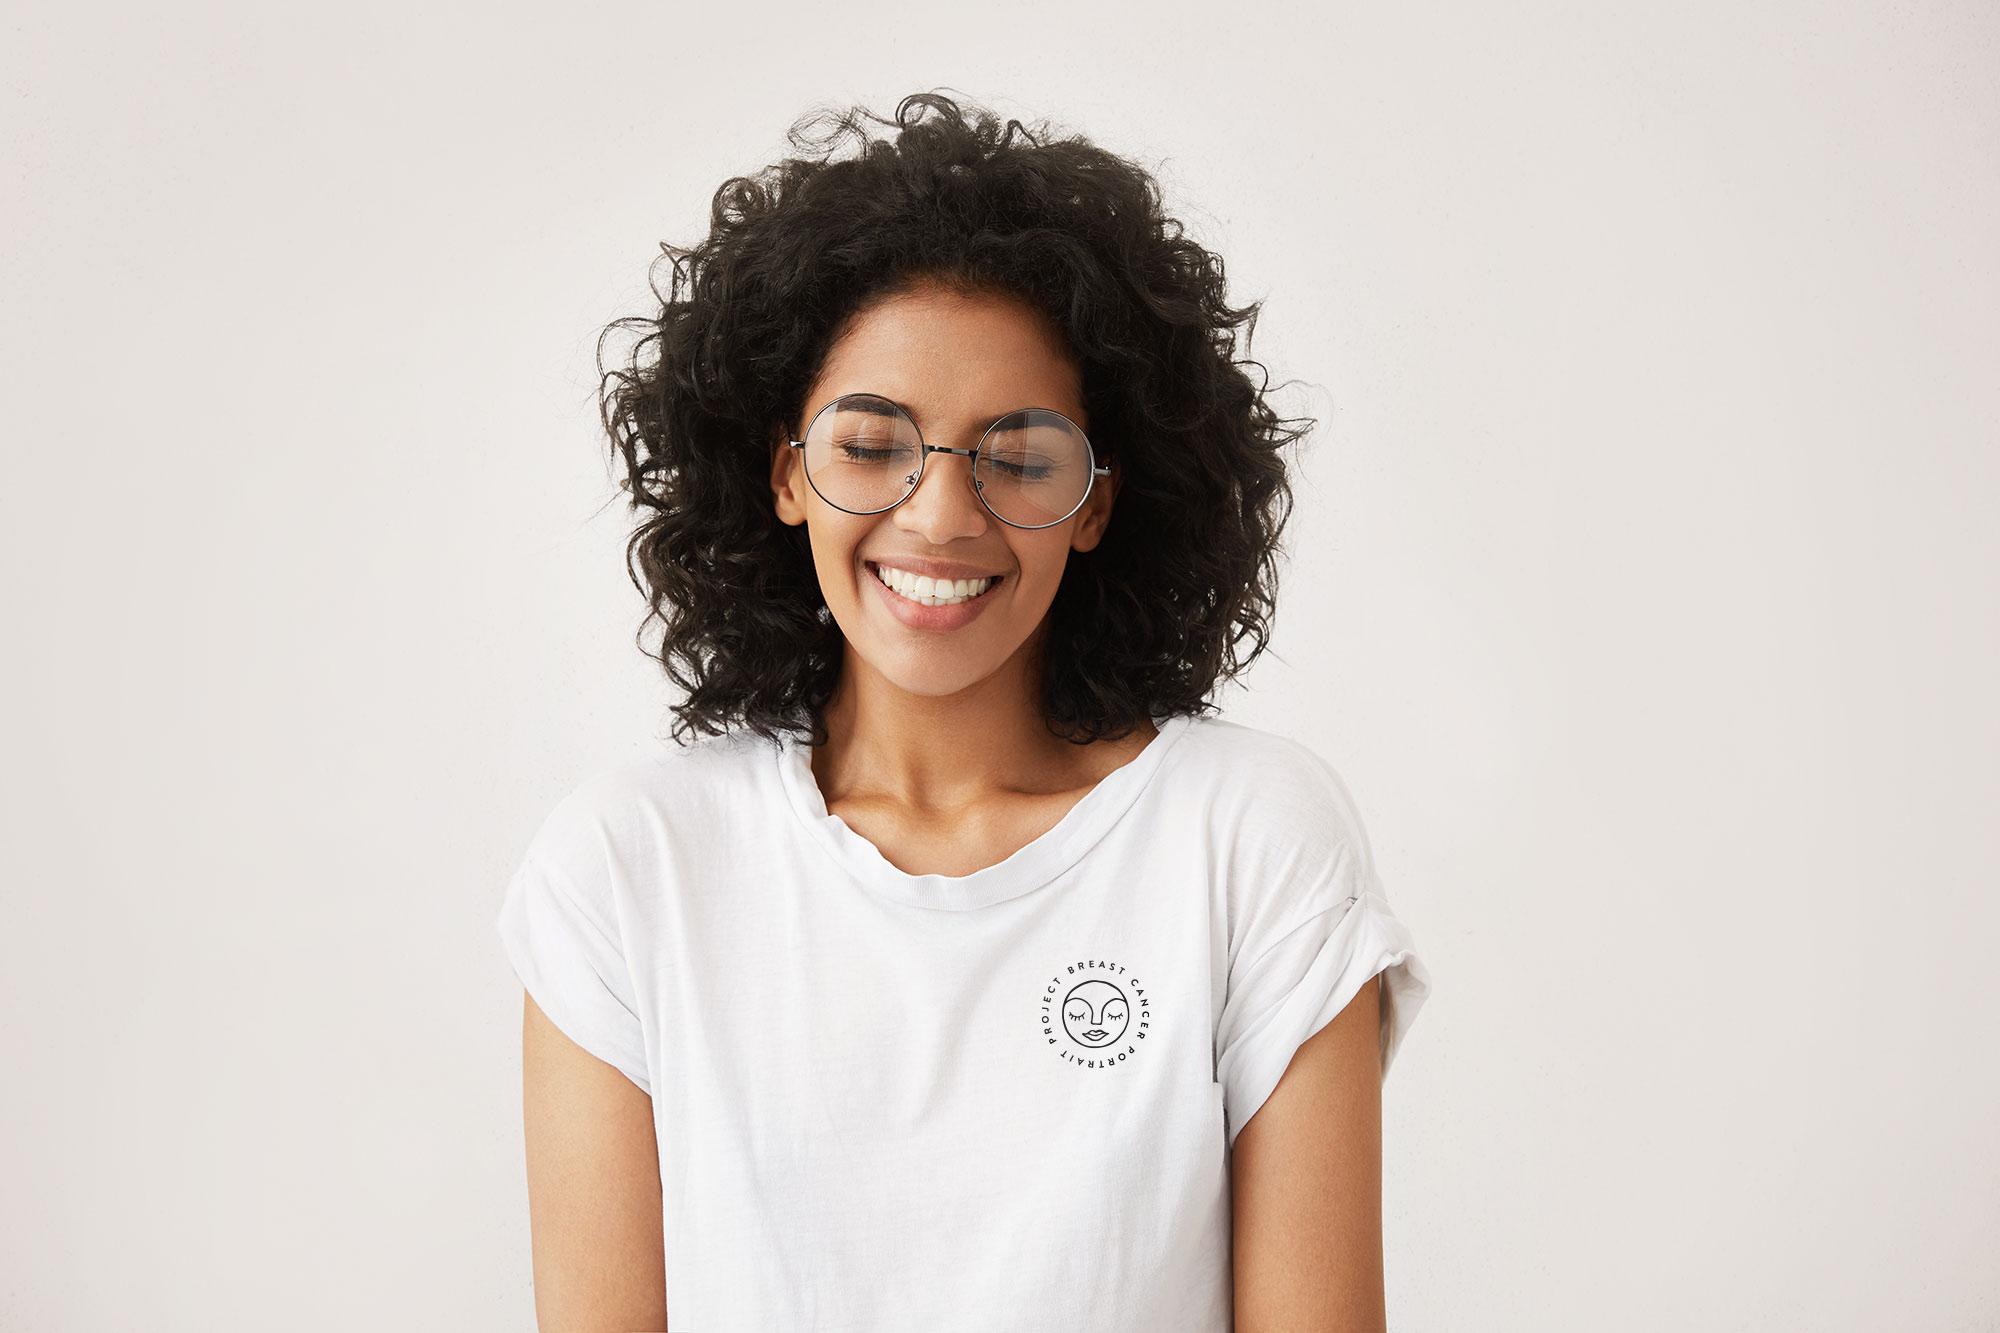 Breast Cancer Portrait Project Shirt Design